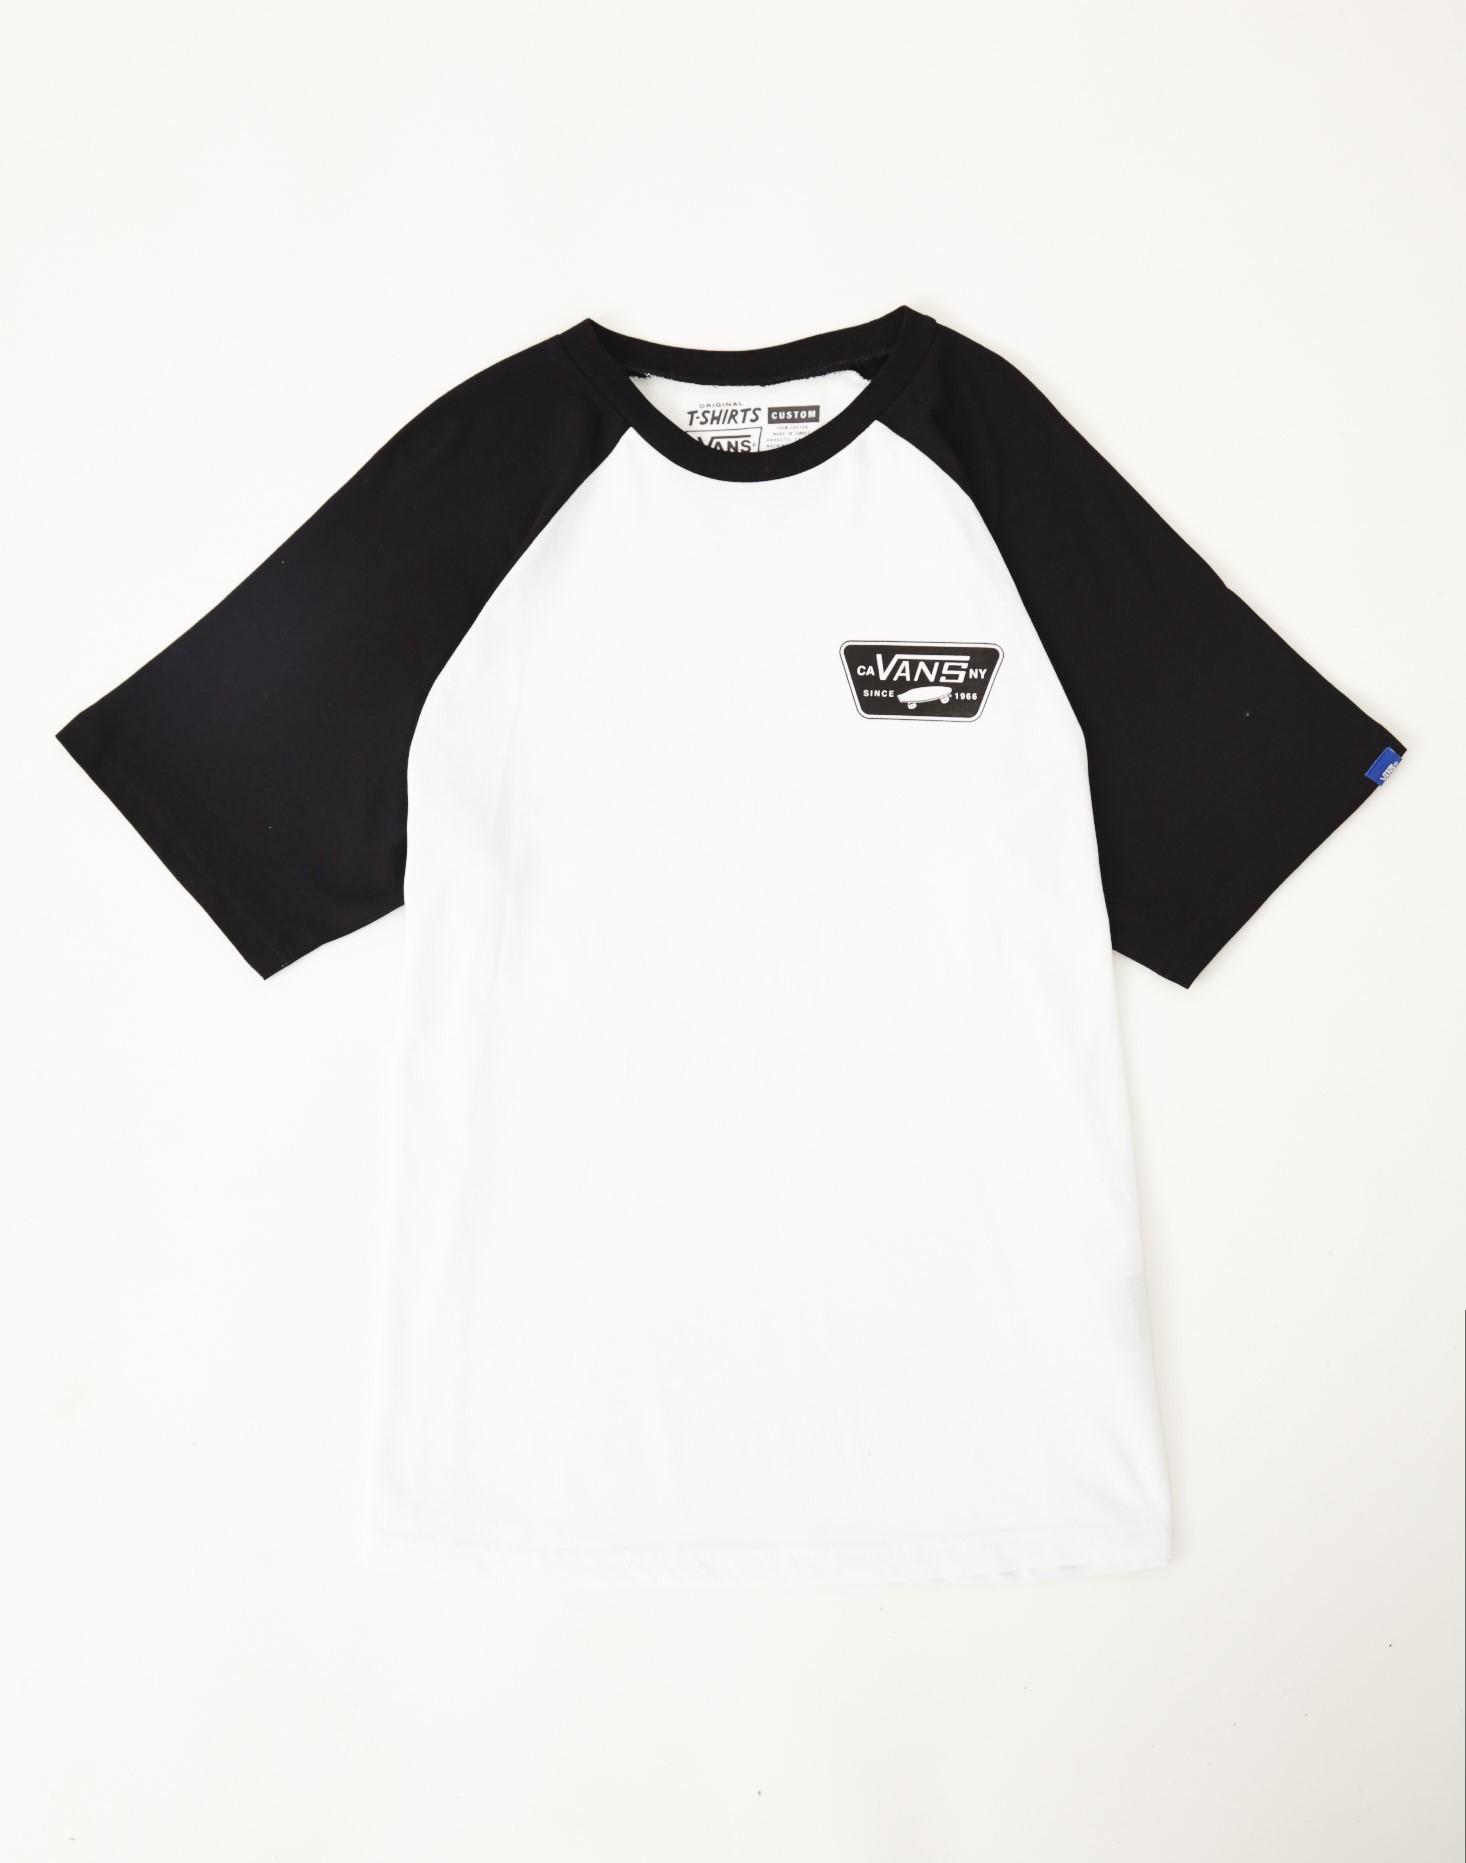 597b91a27d Lyst - Vans Full Patch Short Sleeve Raglan T-shirt White in White ...